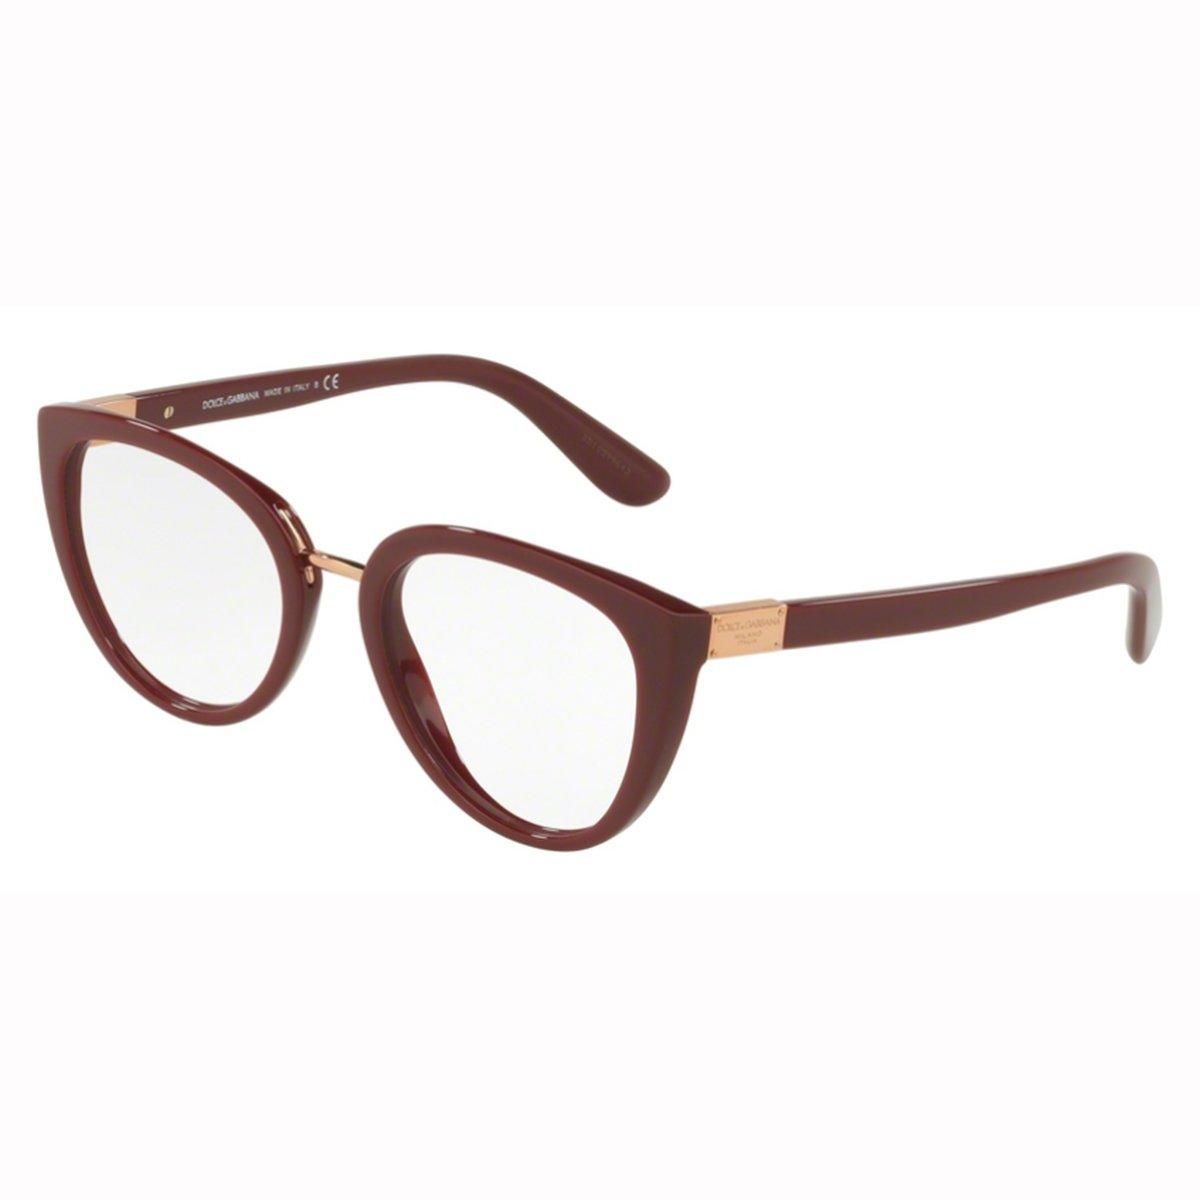 Compre Óculos de Grau Dolce Gabbana em 10X   Tri-Jóia Shop 20c4ddabff